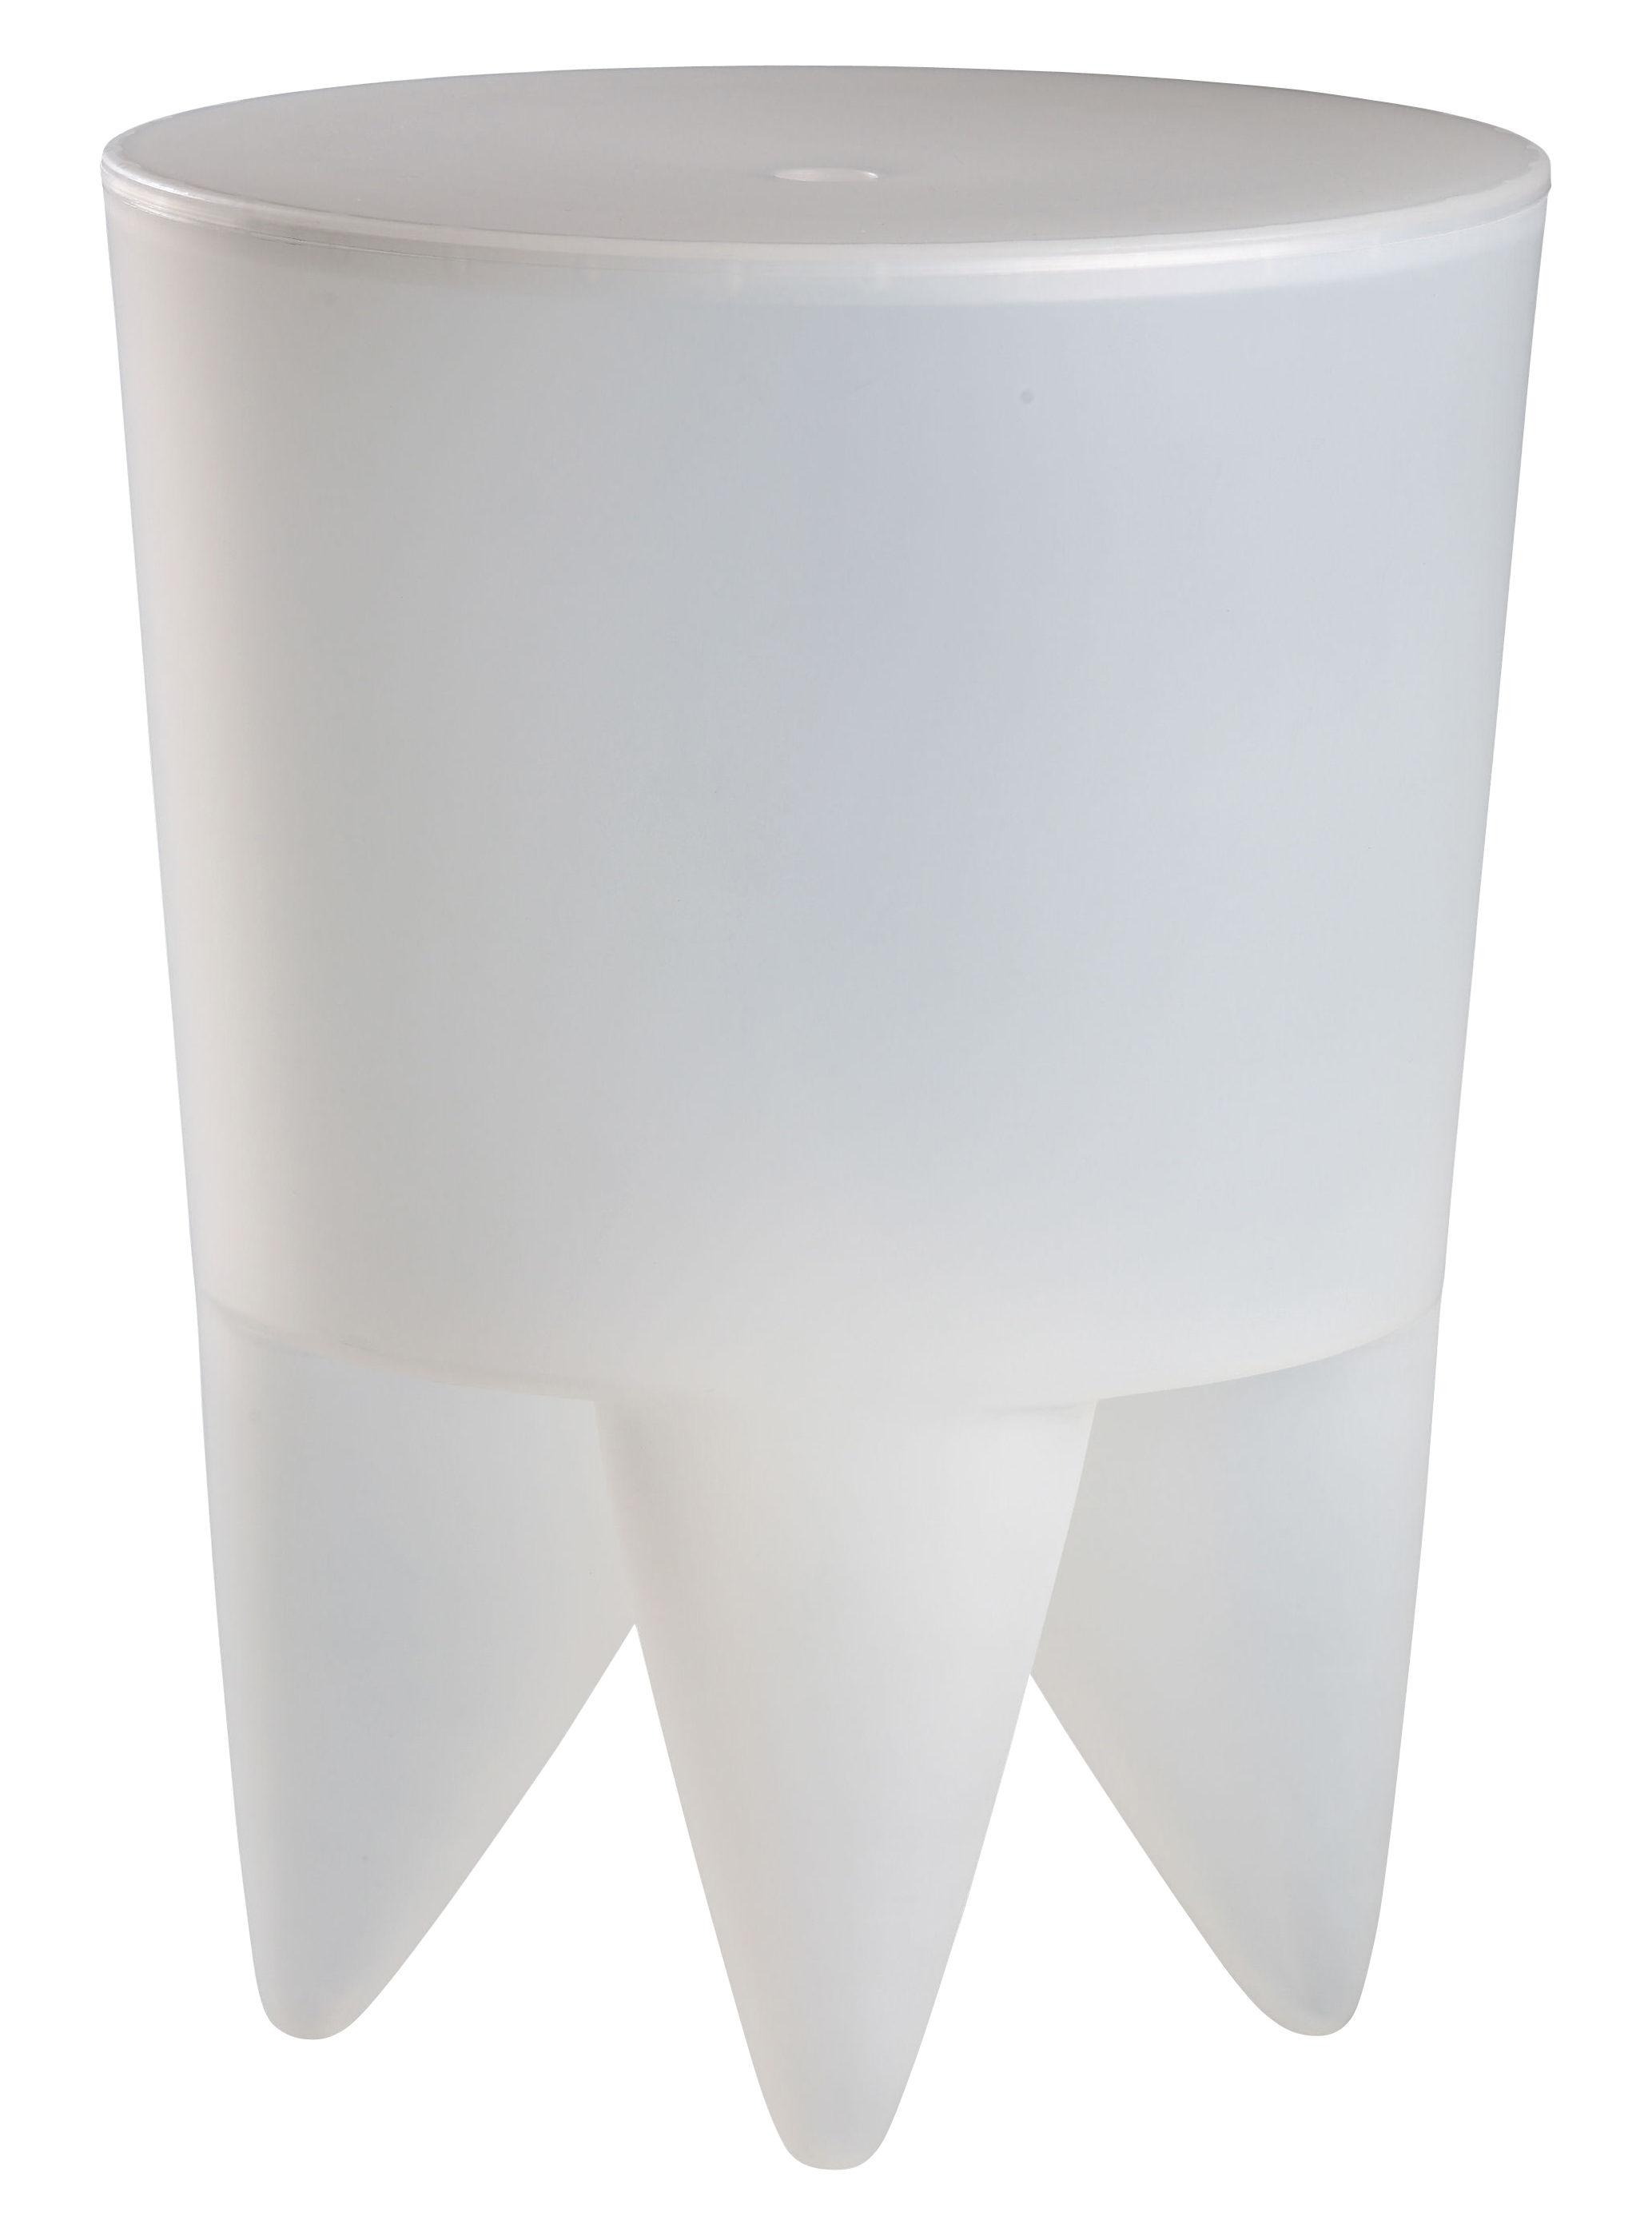 Furniture - Teen furniture - New Bubu 1er Stool - / Box - Plastic by XO - Translucent White - Polypropylene